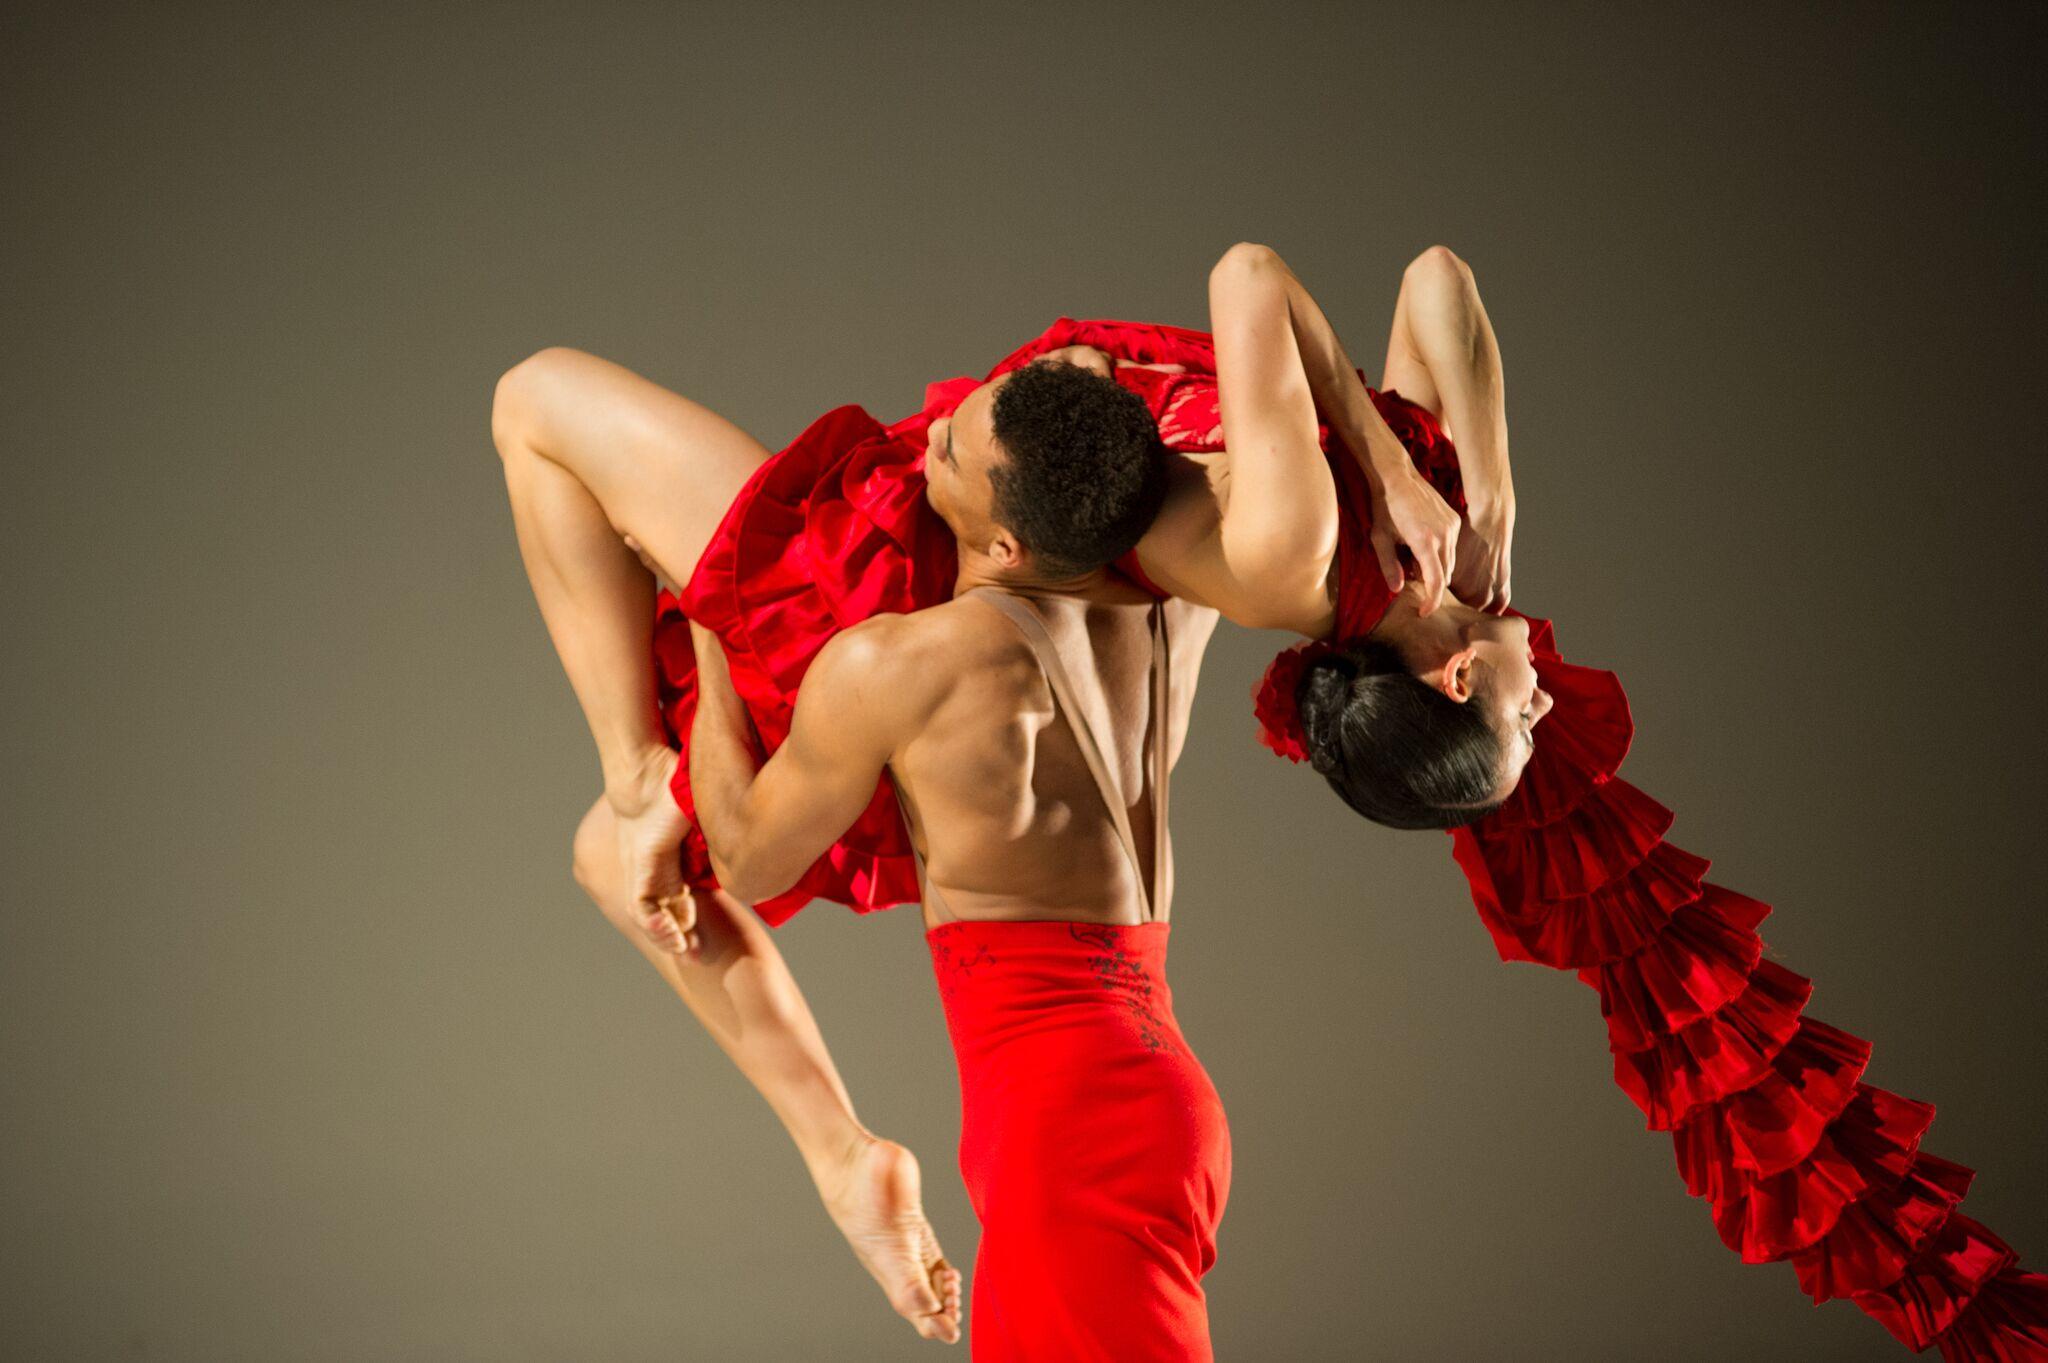 Hispanic History, Hispanic Art, Ballet, KOLUMN Magazine, KOLUMN